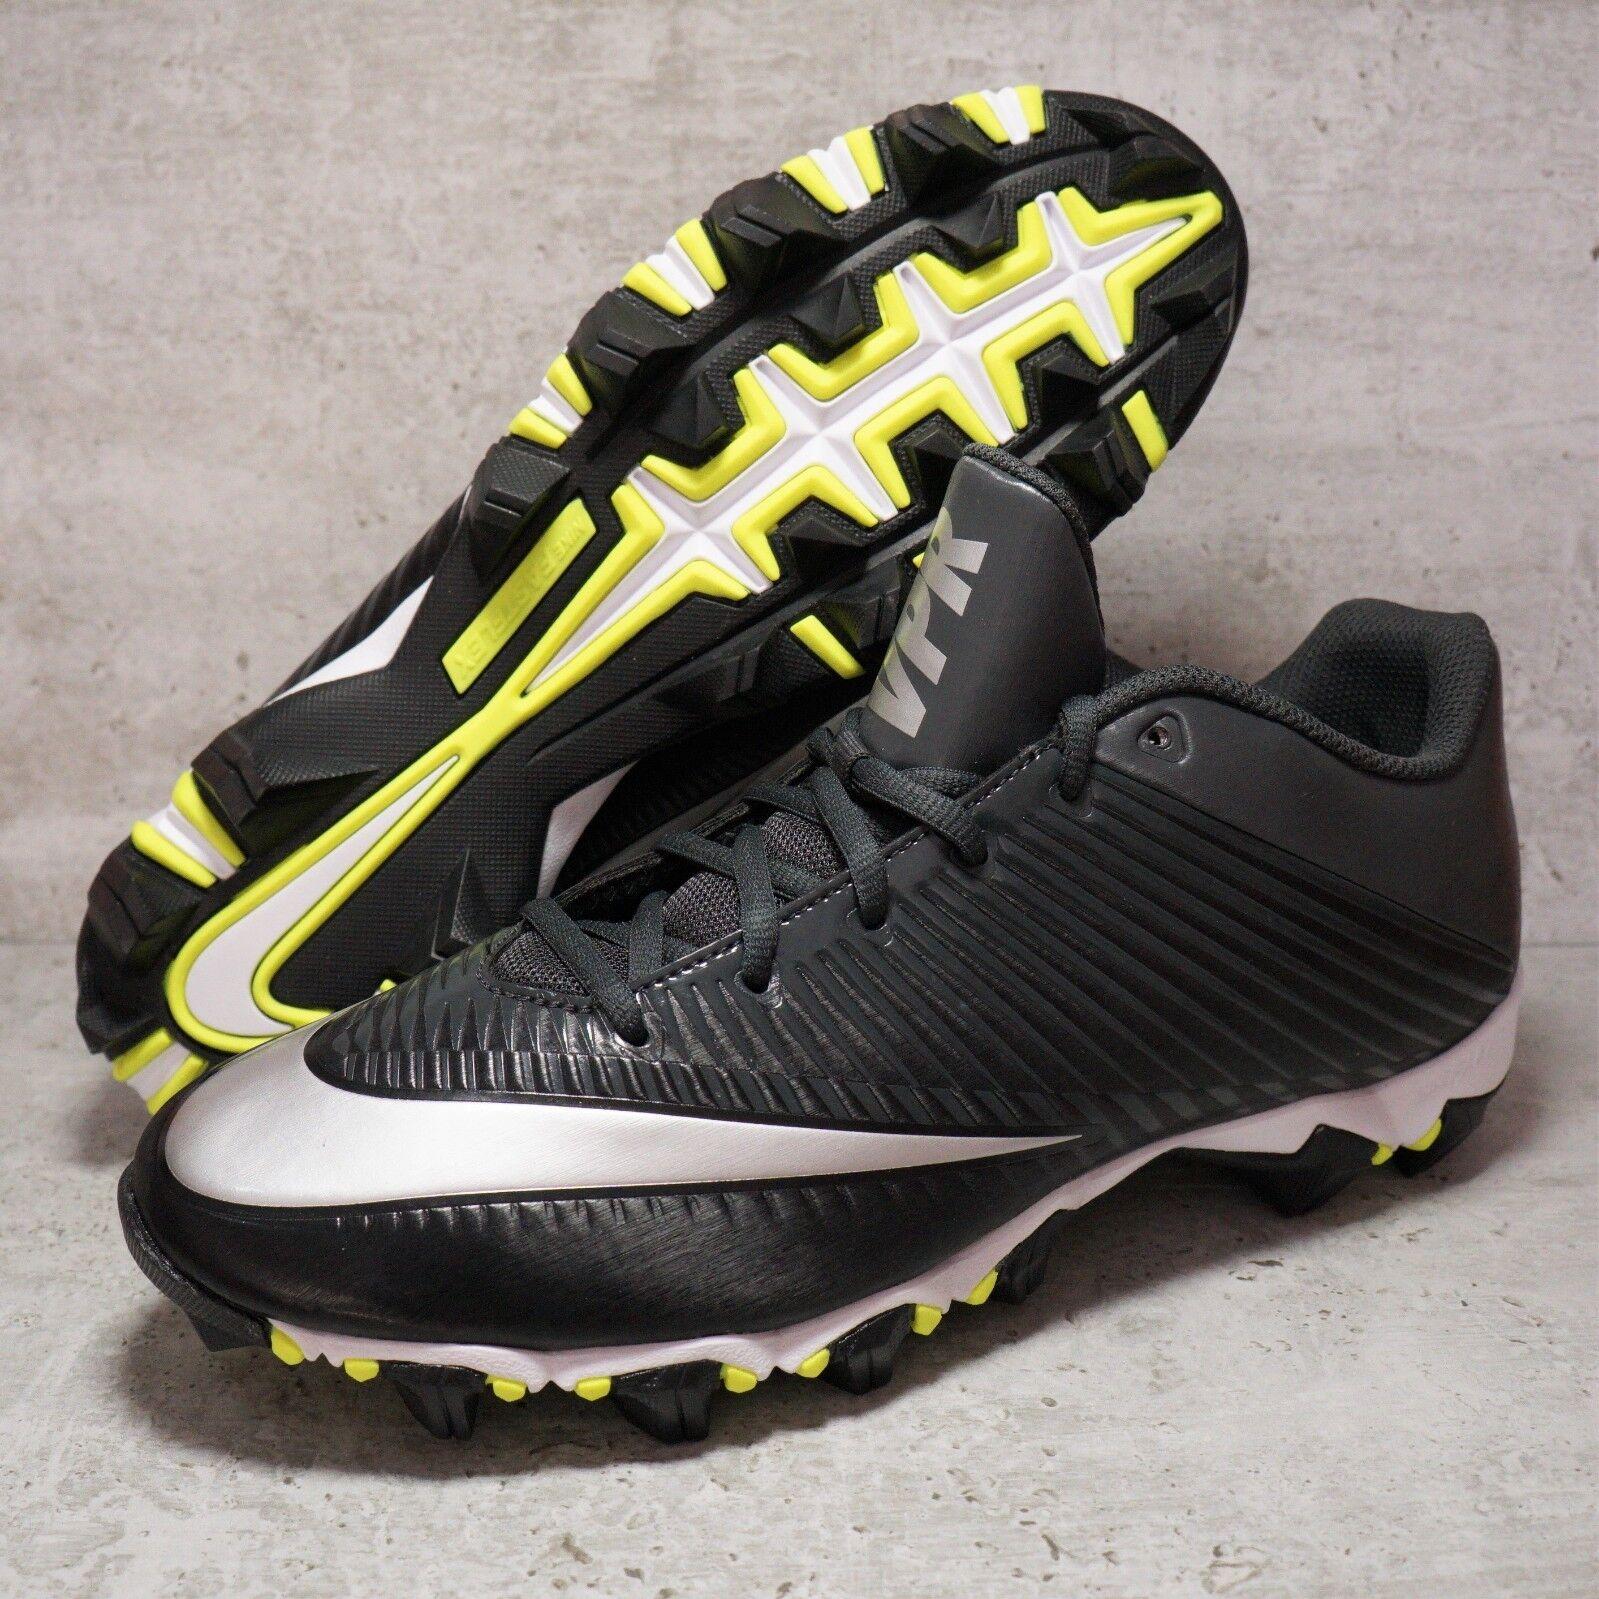 1601a33188b8 NEW Mens Nike Vapor Shark 2 Men's Football Cleats Cleats Cleats Size 11  833391-002 fae93c